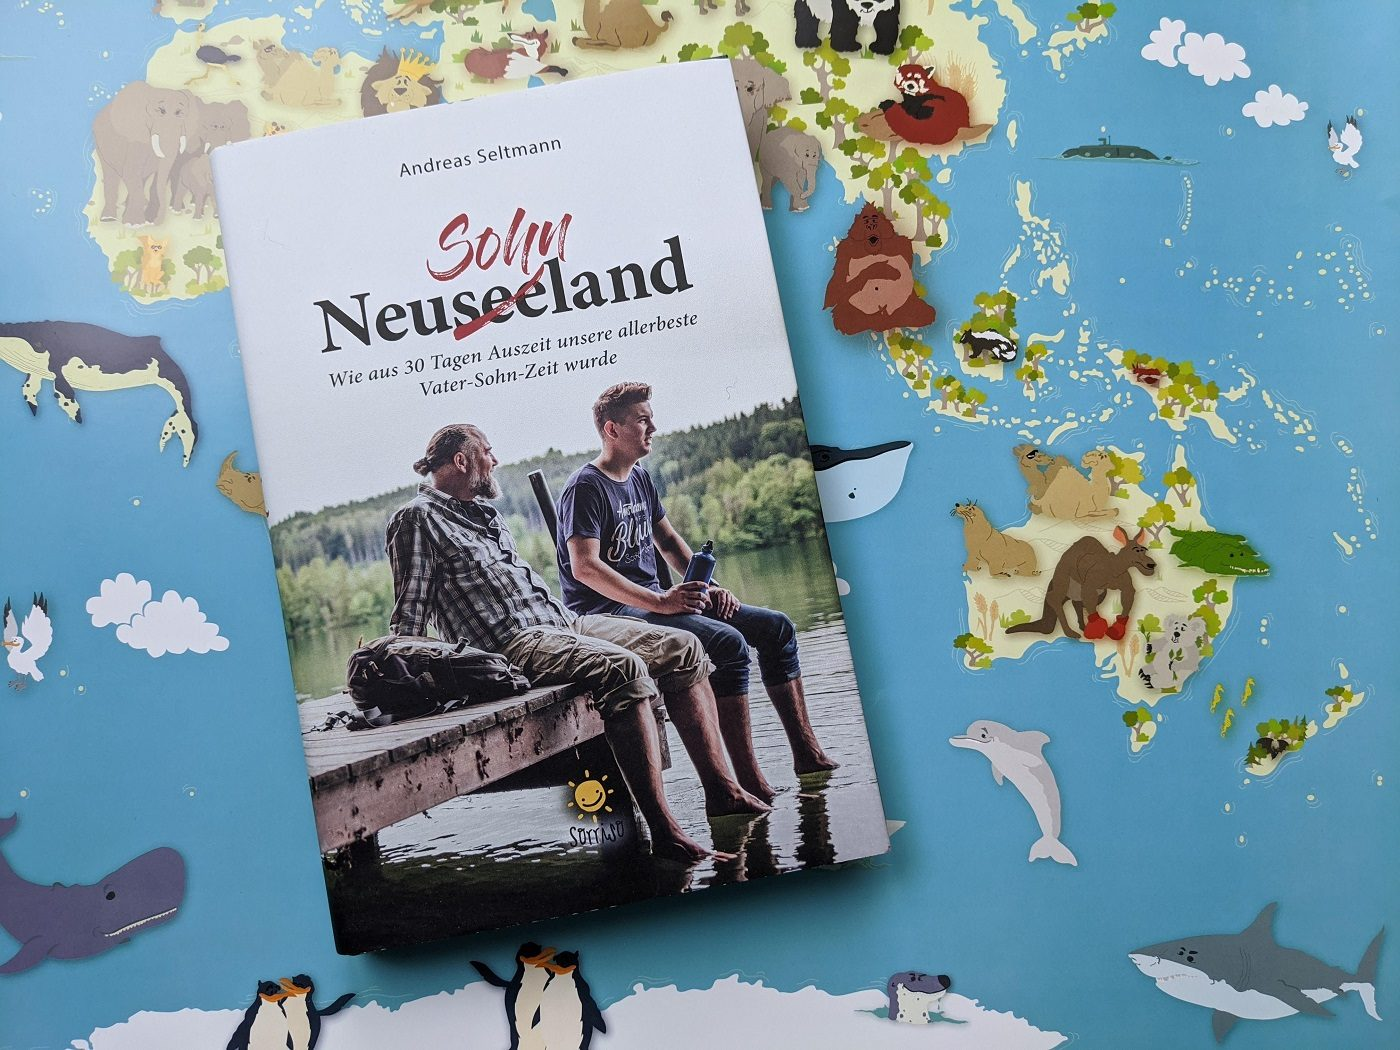 neuseesohnland von Andreas Seltmann